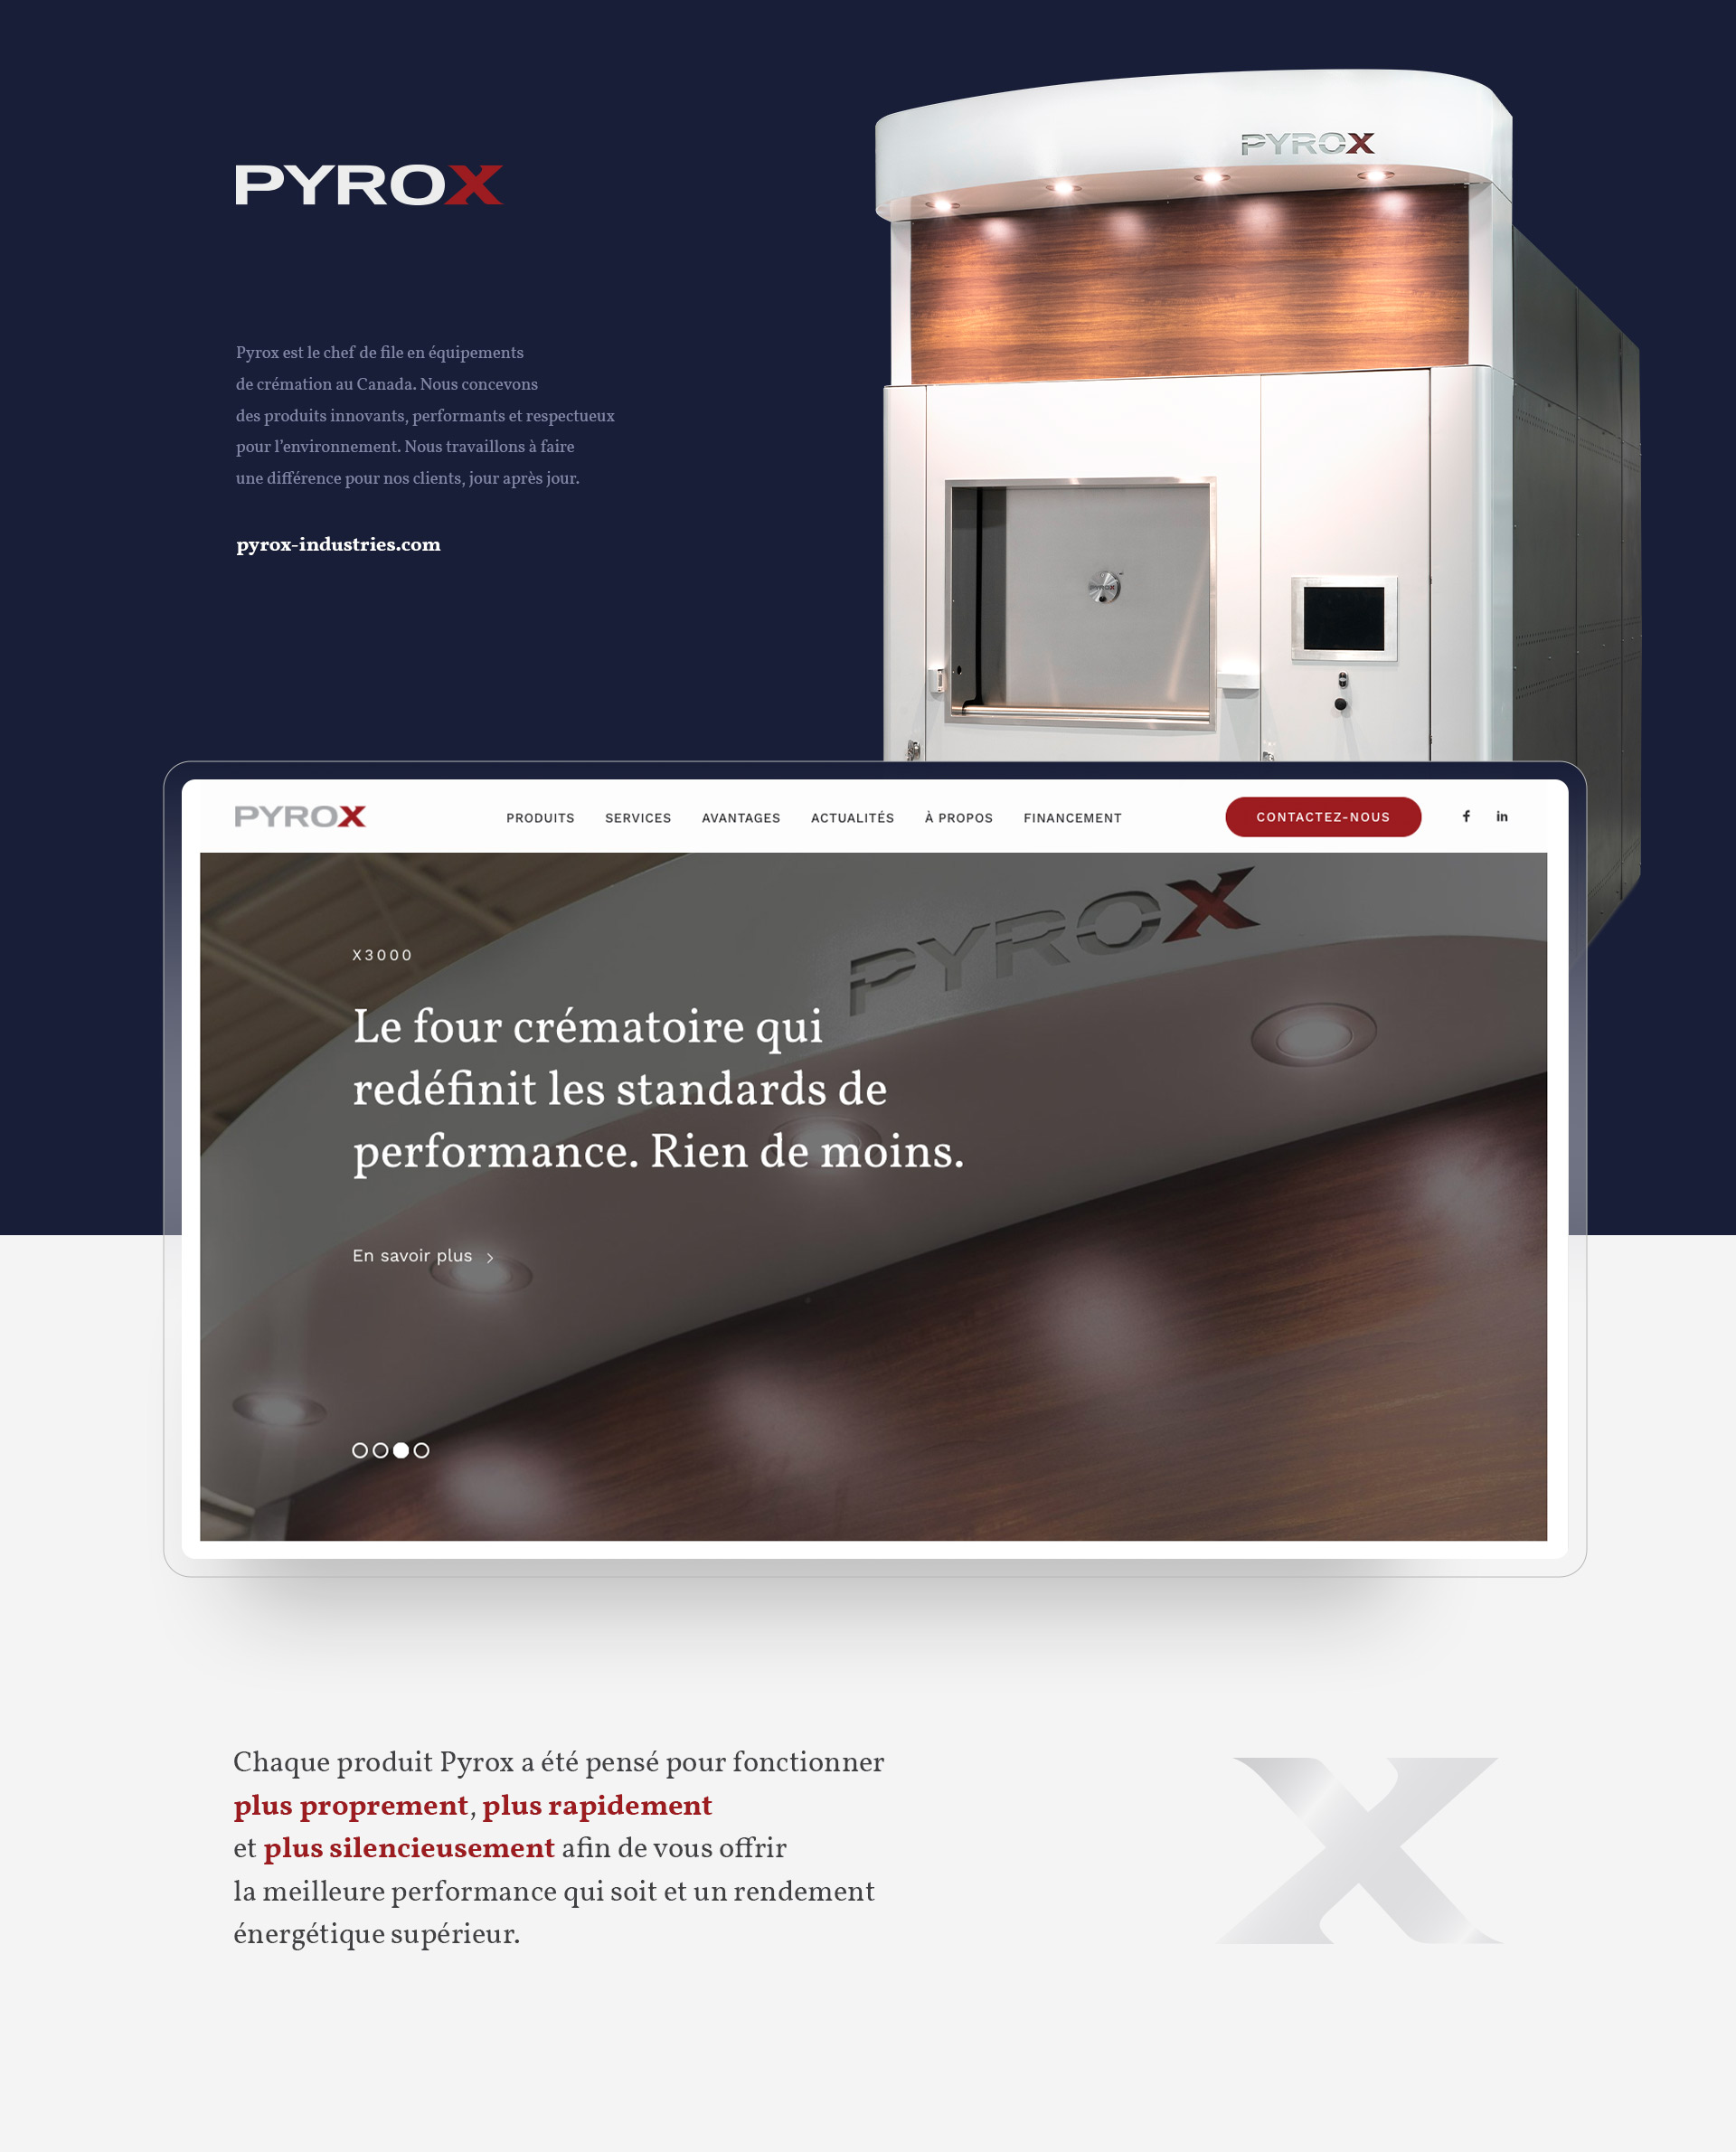 Pyrox Industries - Environnement de marque - website - site web